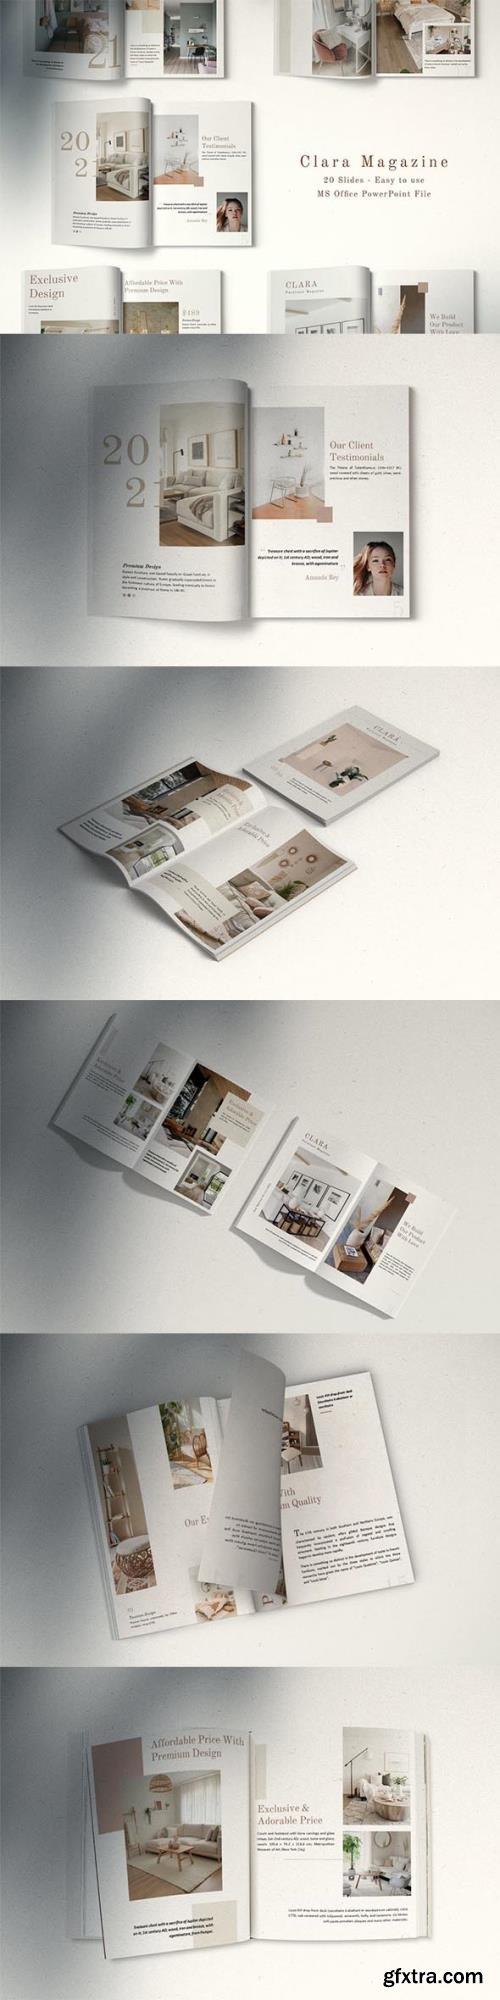 Clara Minimalist Magazine Layout Powerpoint, Keynote and Google Slides Template